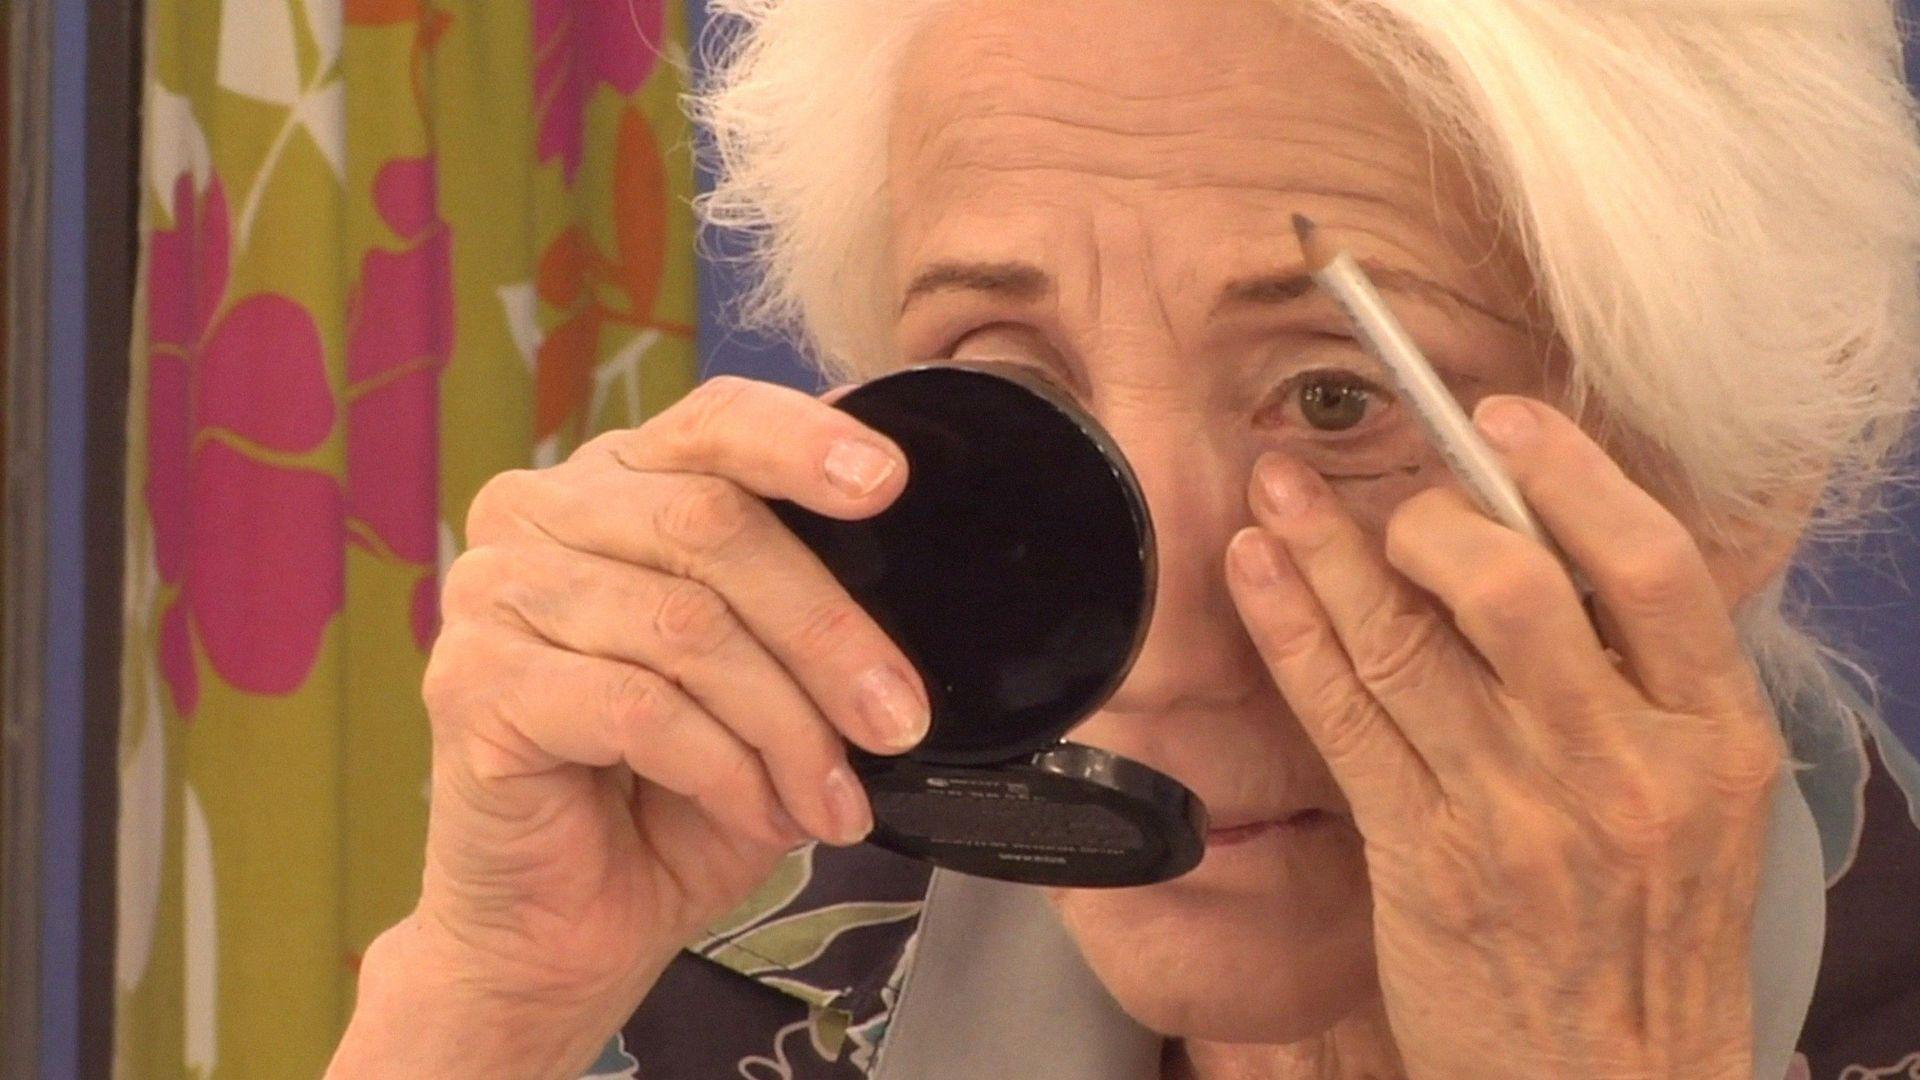 OLYMPIA, Olympia Dukakis applying stage makeup, 2018.